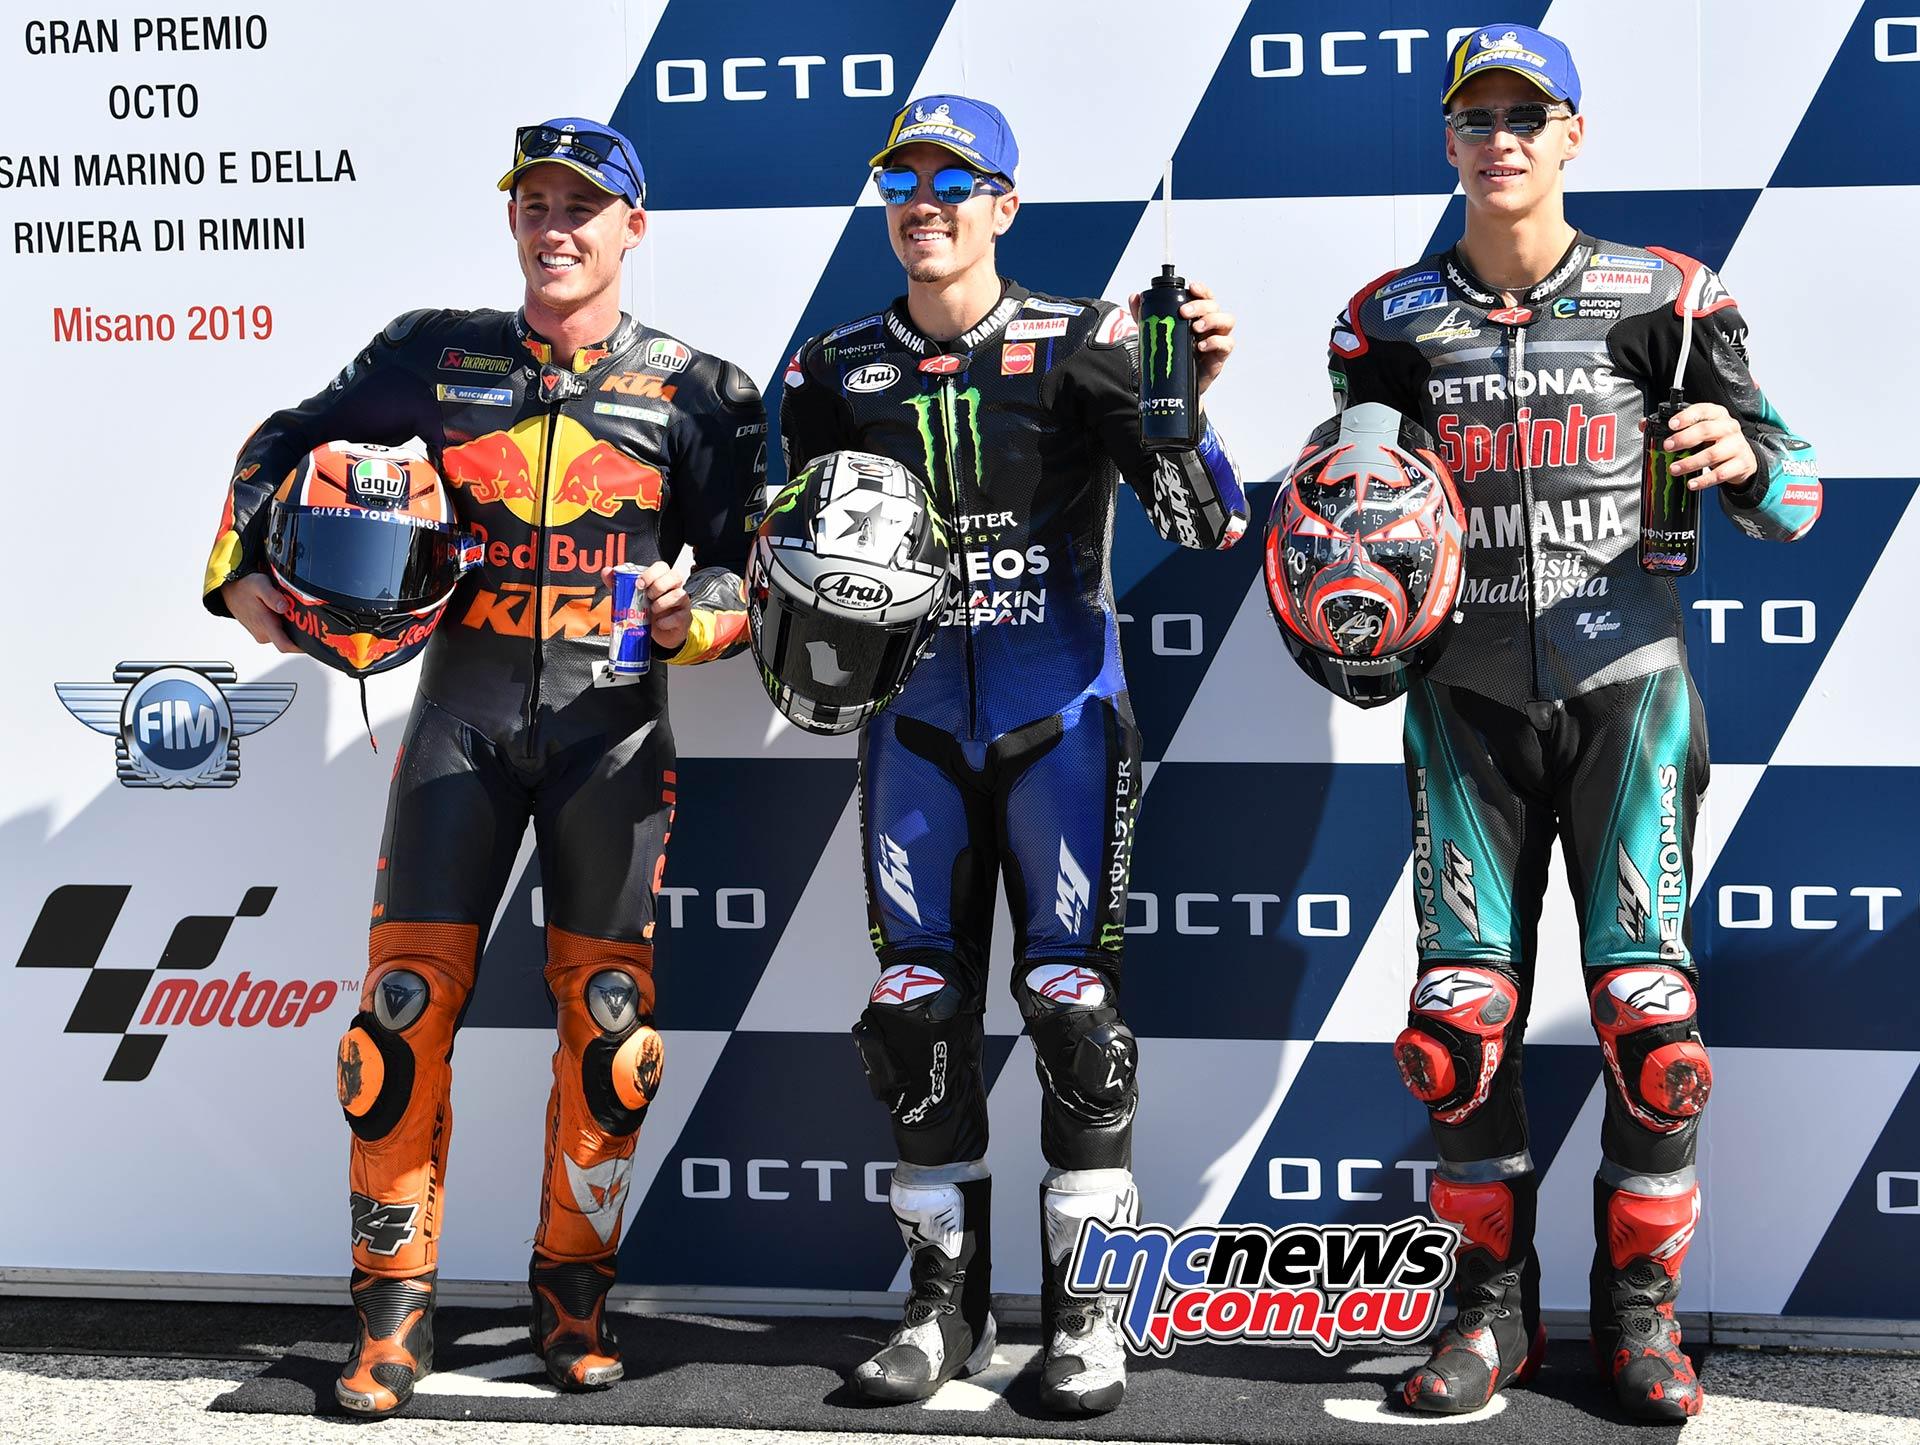 MotoGP Rnd Misano QP MotoGP Pole Espargaro Viñales Quartararo